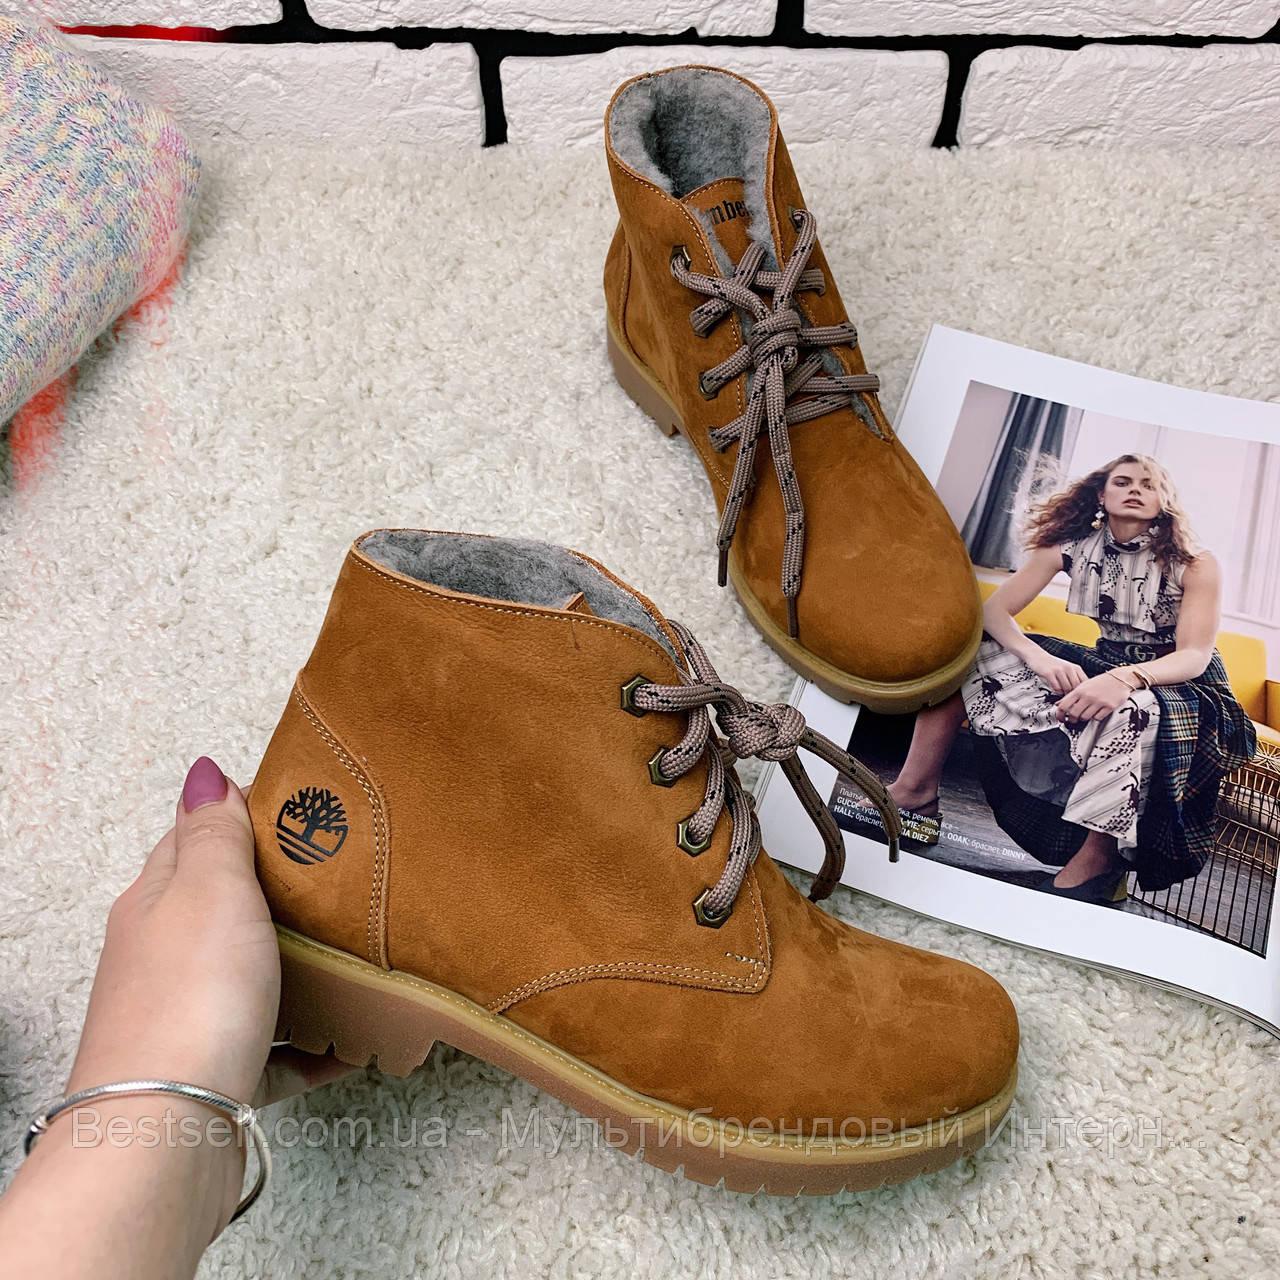 Зимние ботинки  (на меху) Timberland   [38 последний размер]